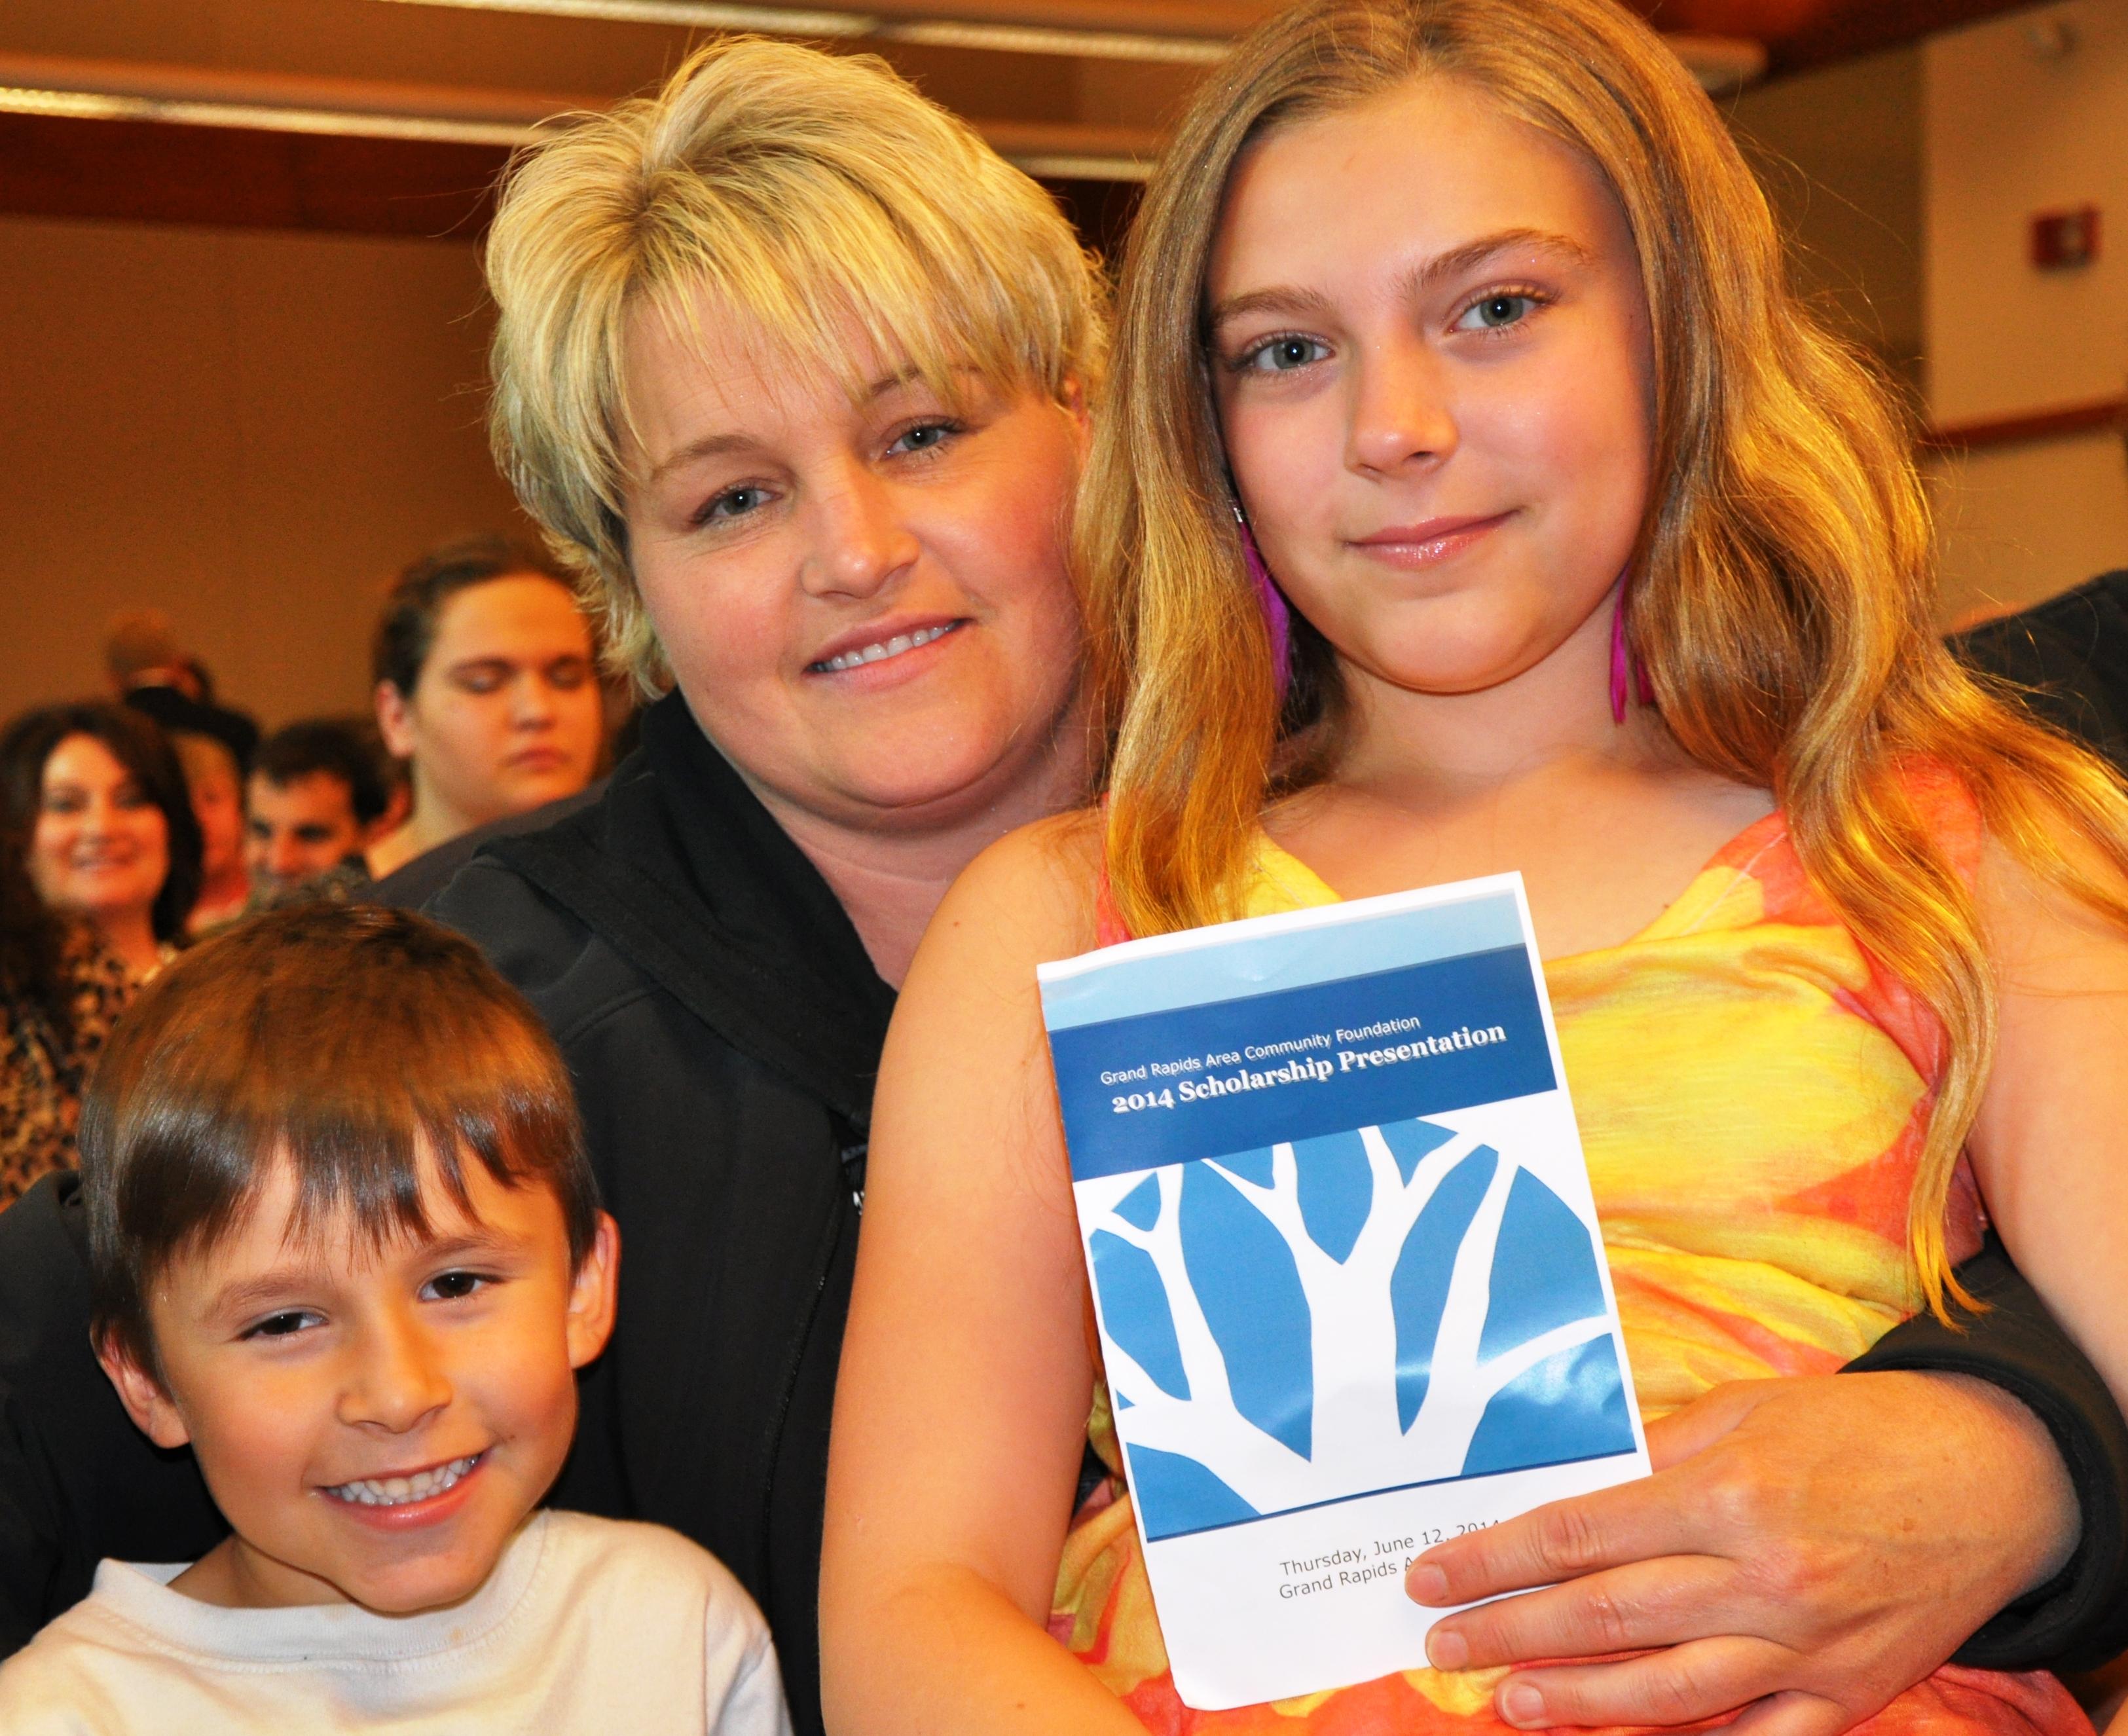 Trboyevich family